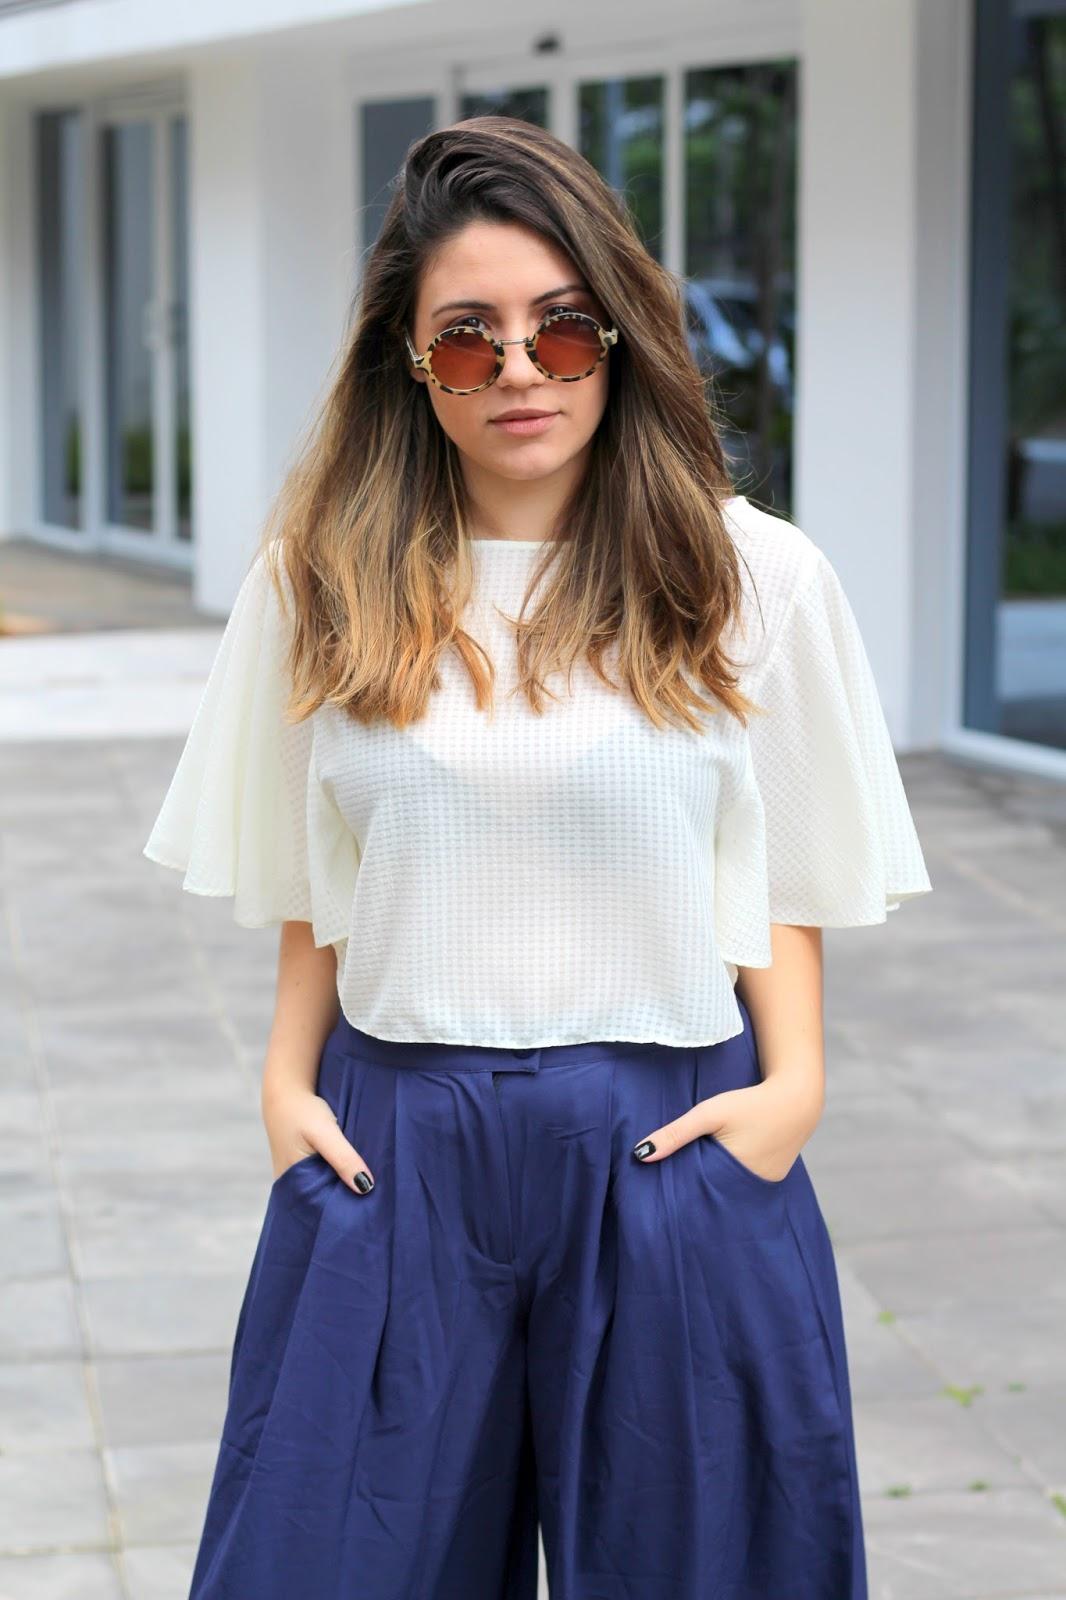 Look Ana do dia Pantacourt twinkledeals óculos niina screts stores guarulhos blogueira